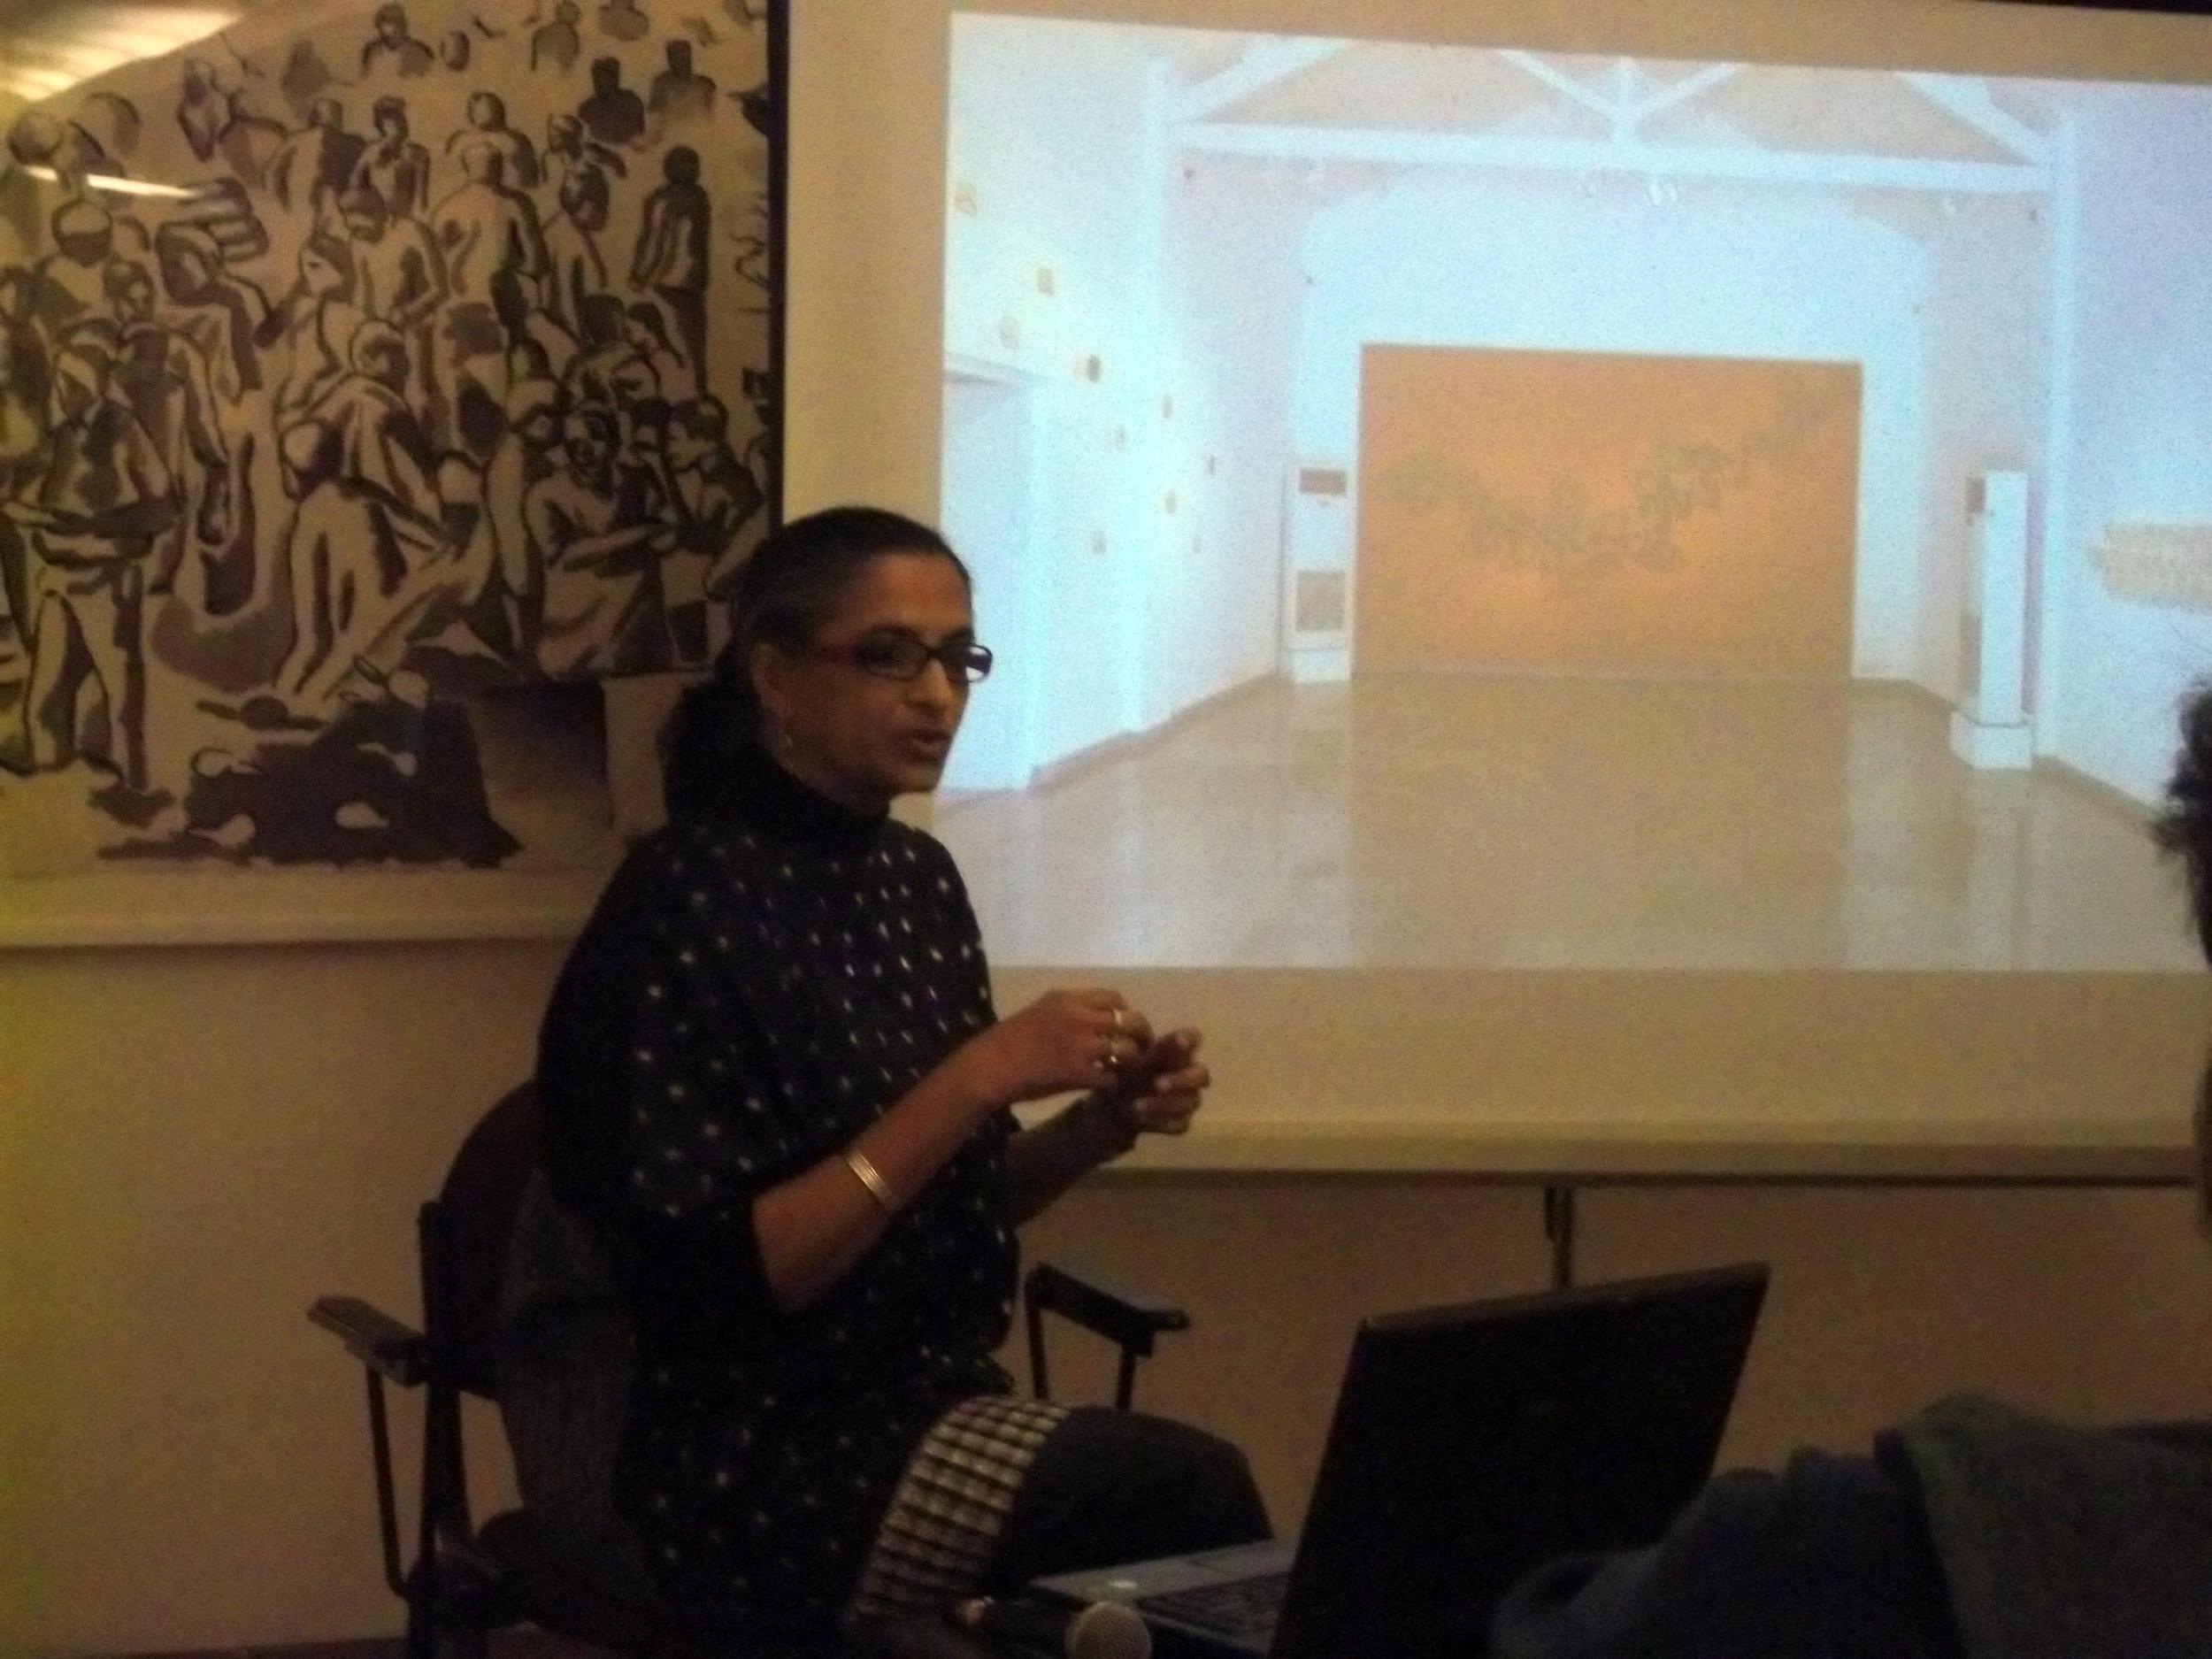 Manisha Parekh presenting her drawings